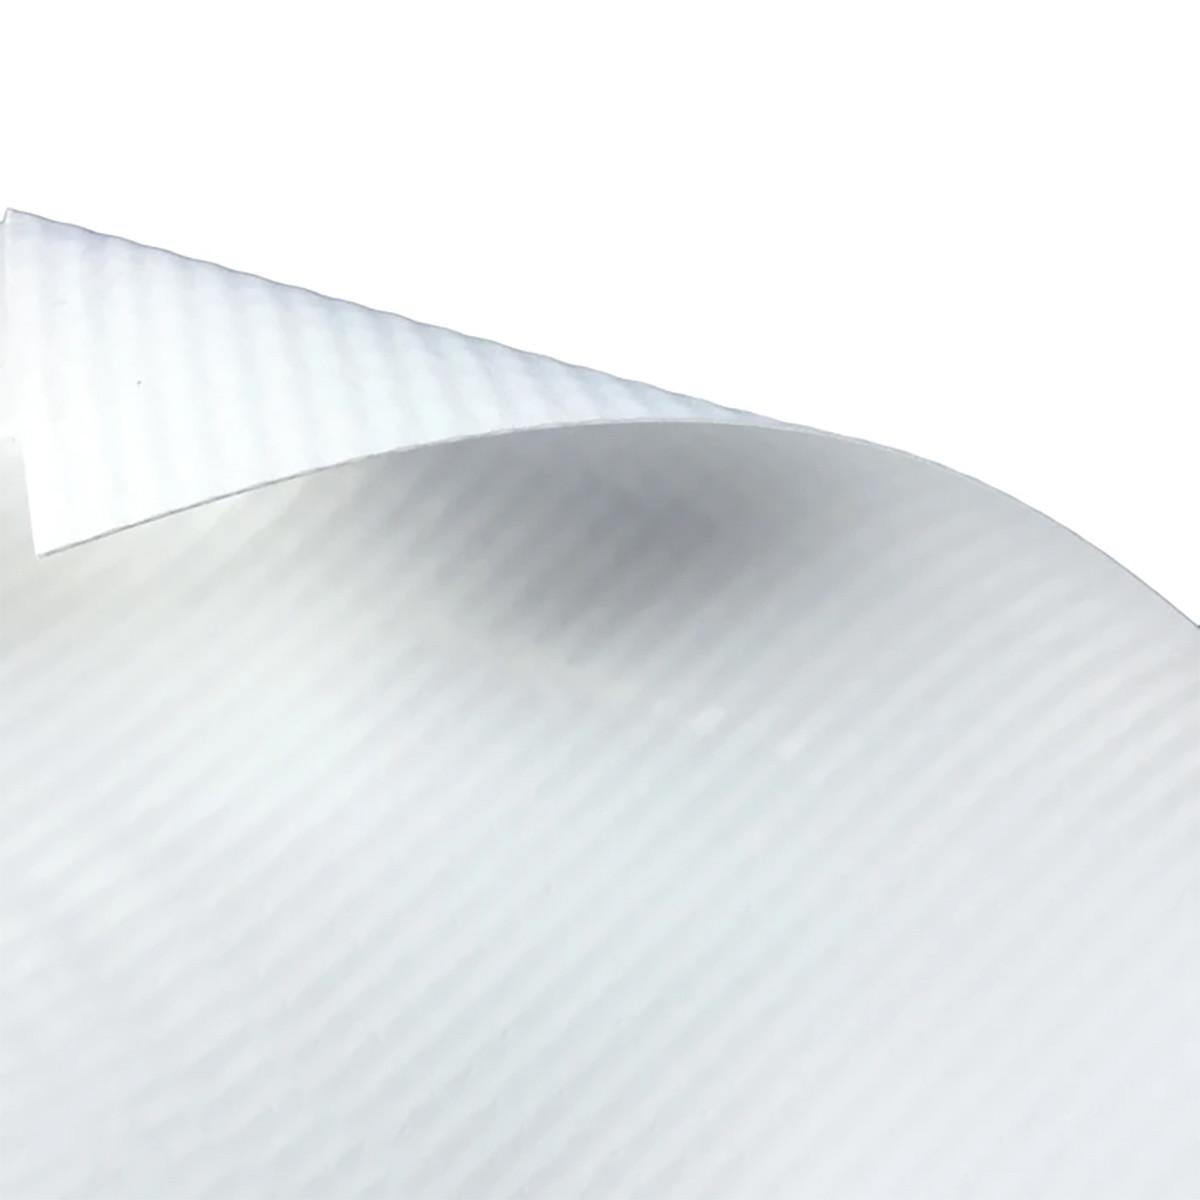 Frontlit baner 3.2x50m 440g mat